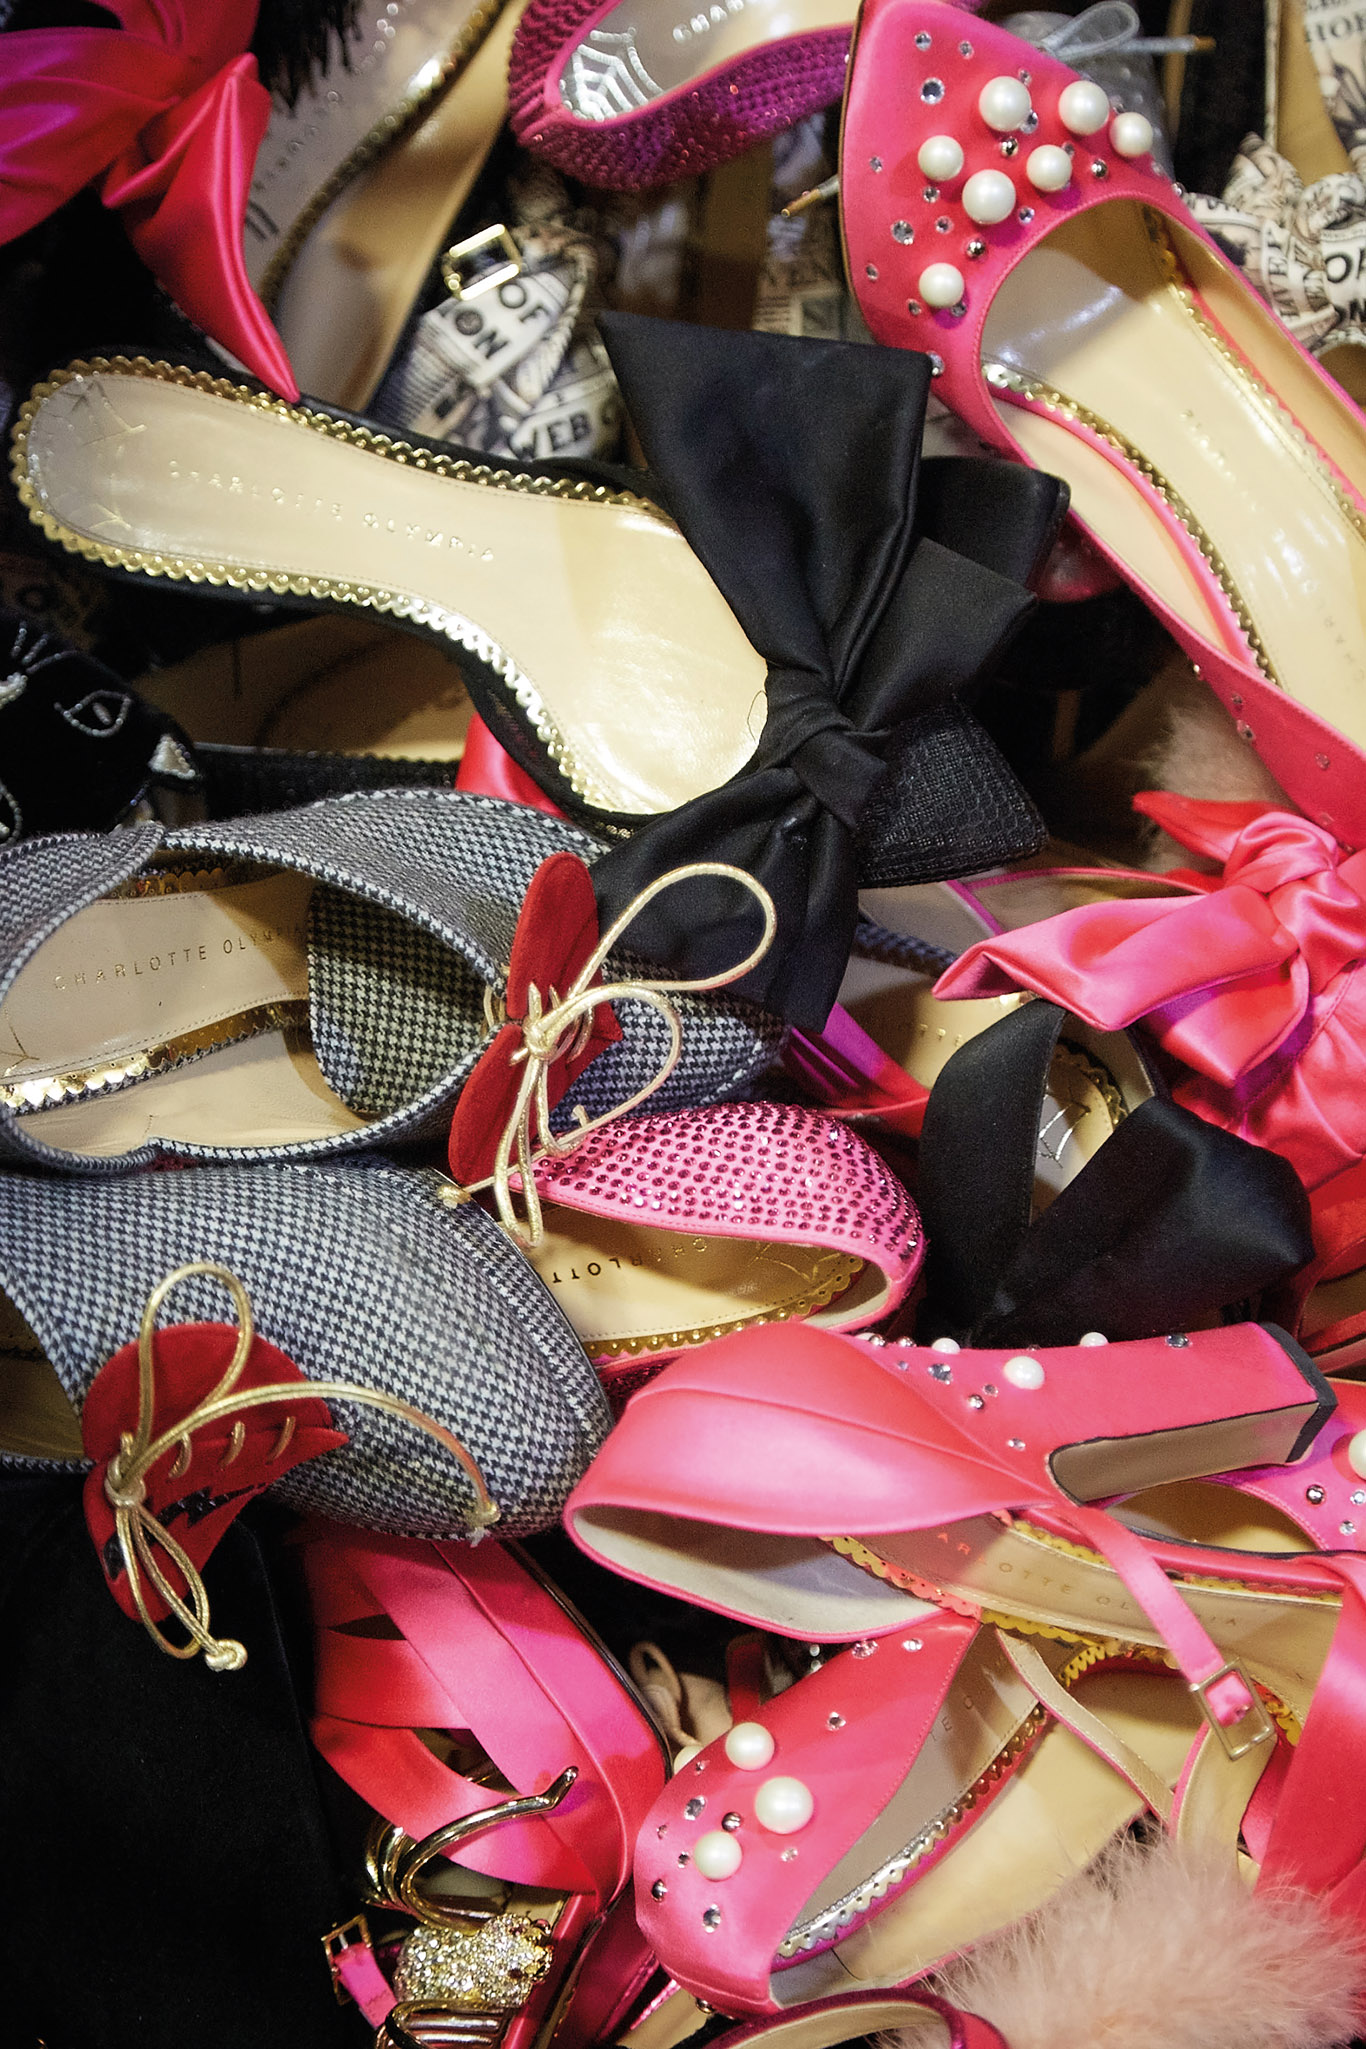 Charlotte Olympia Adding 'Sample Sale